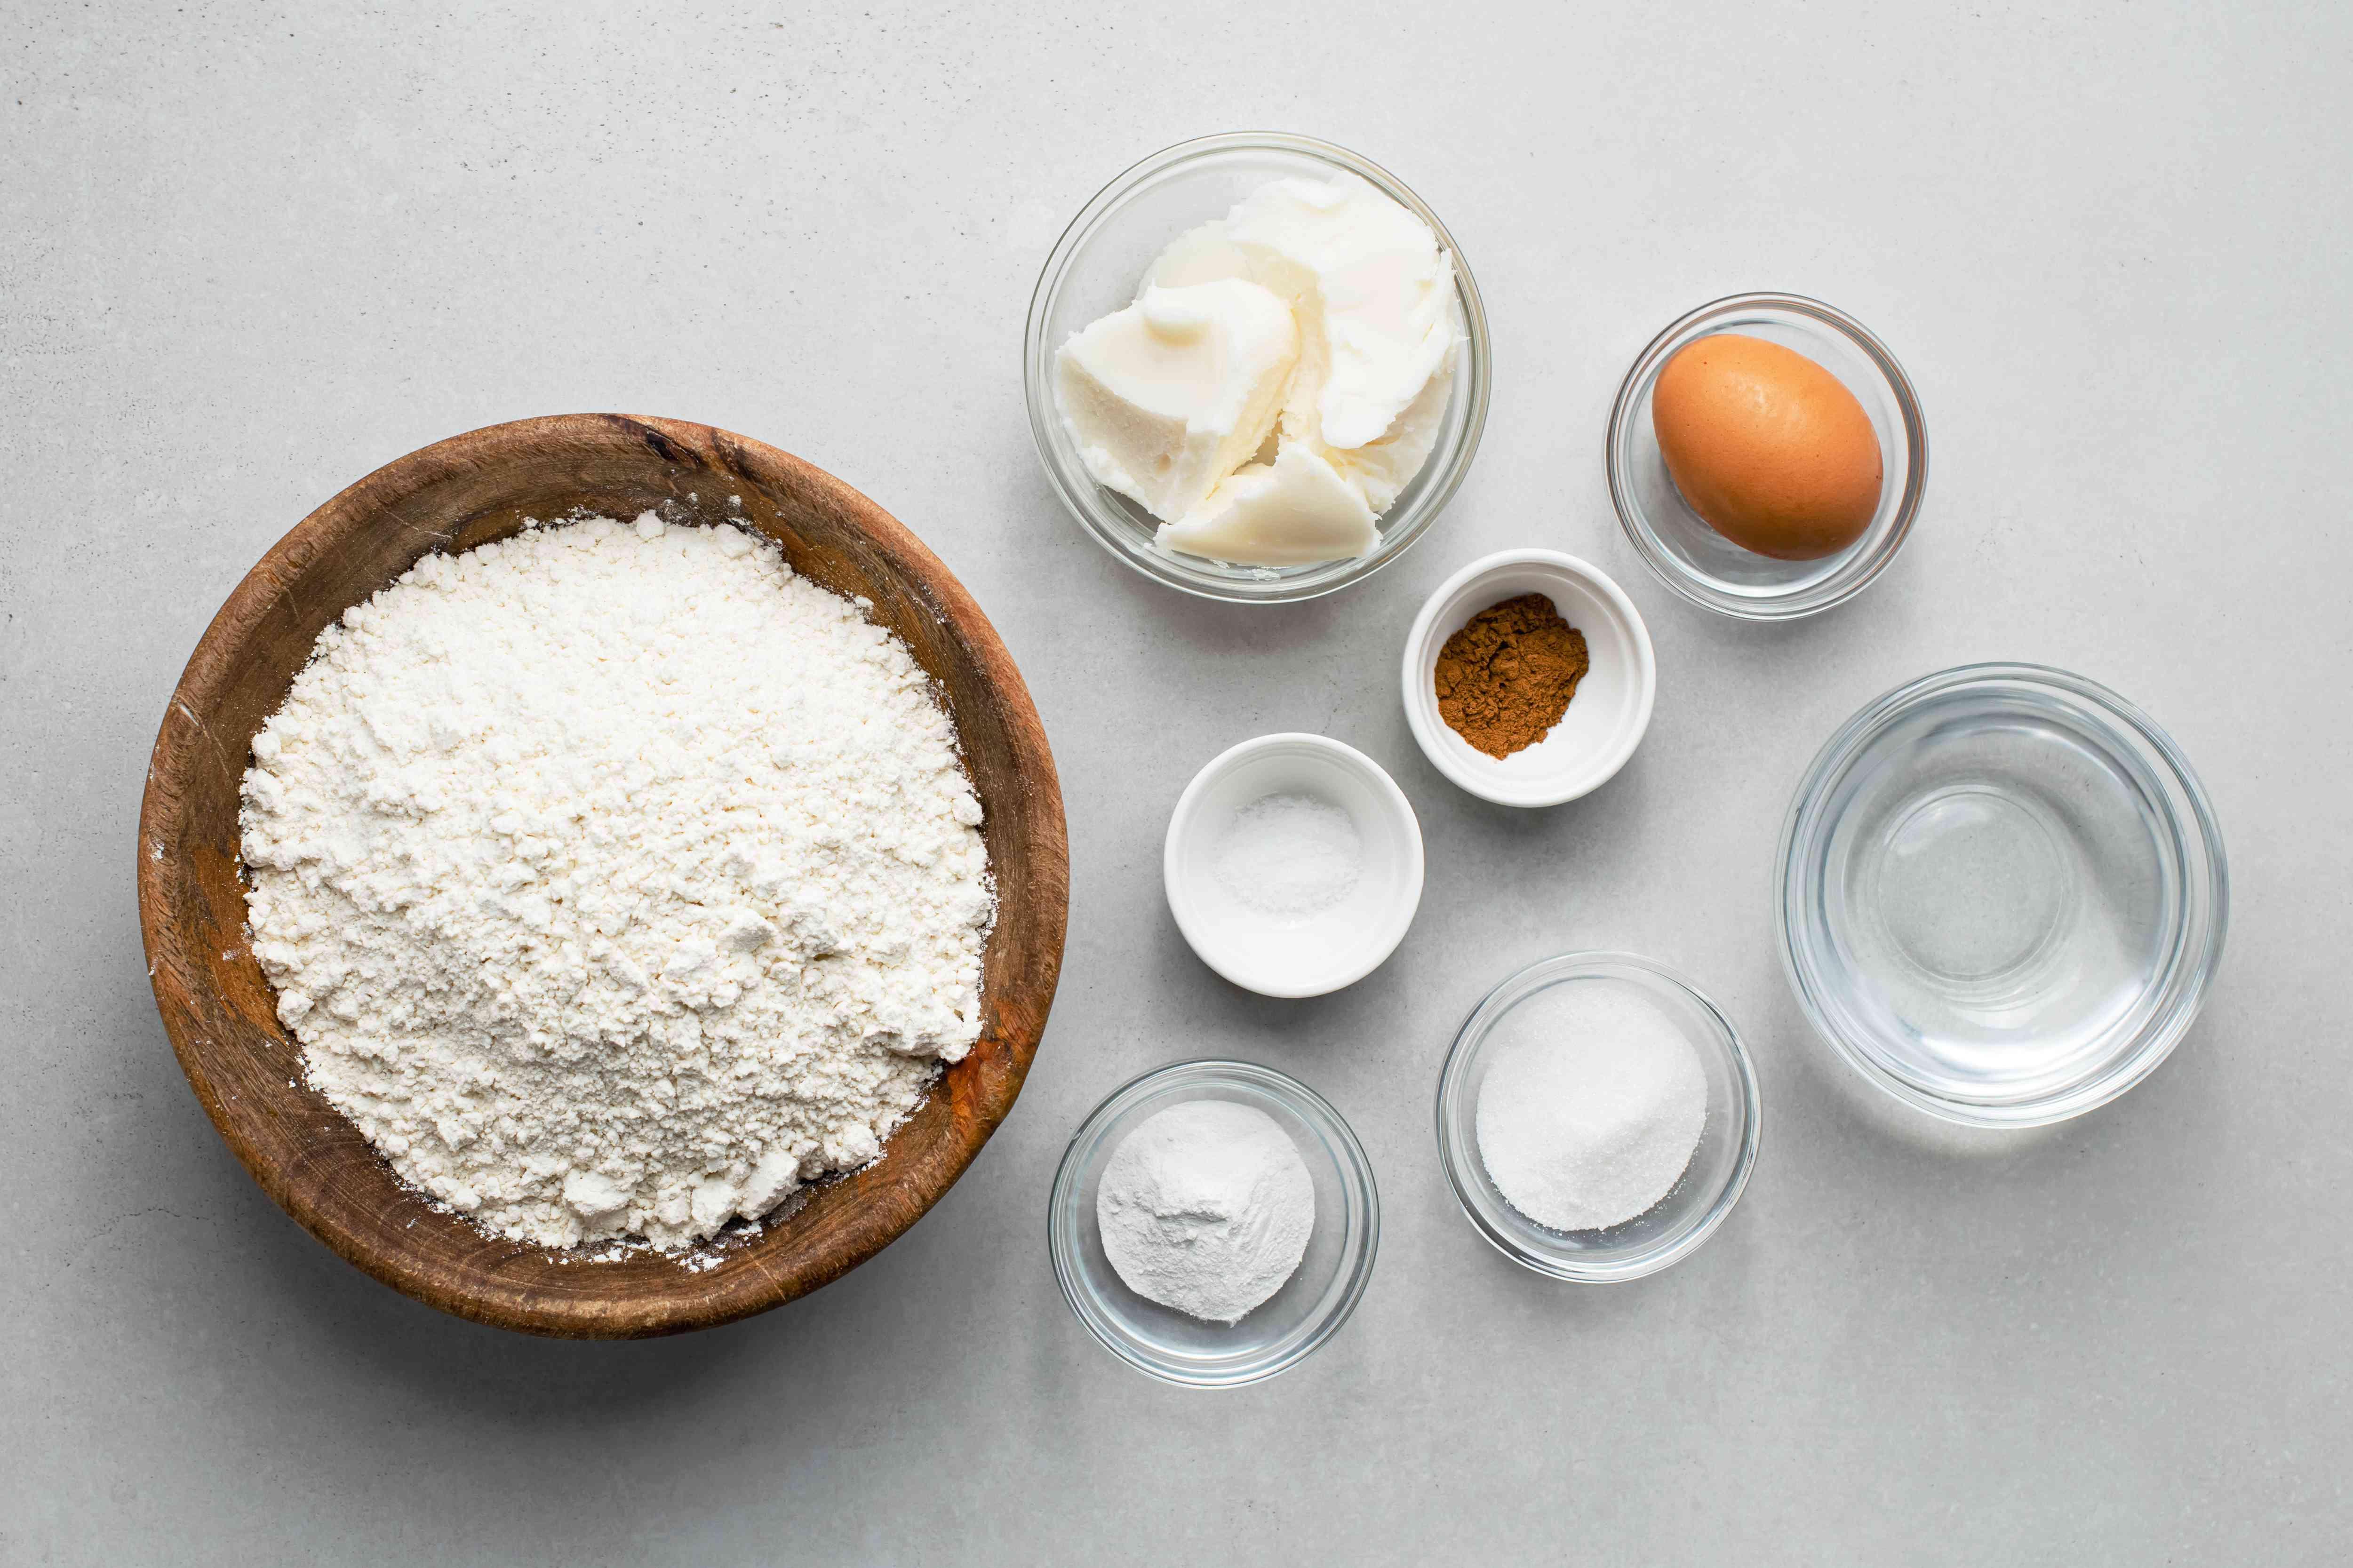 Abuela's Apple Empanadas dough ingredients